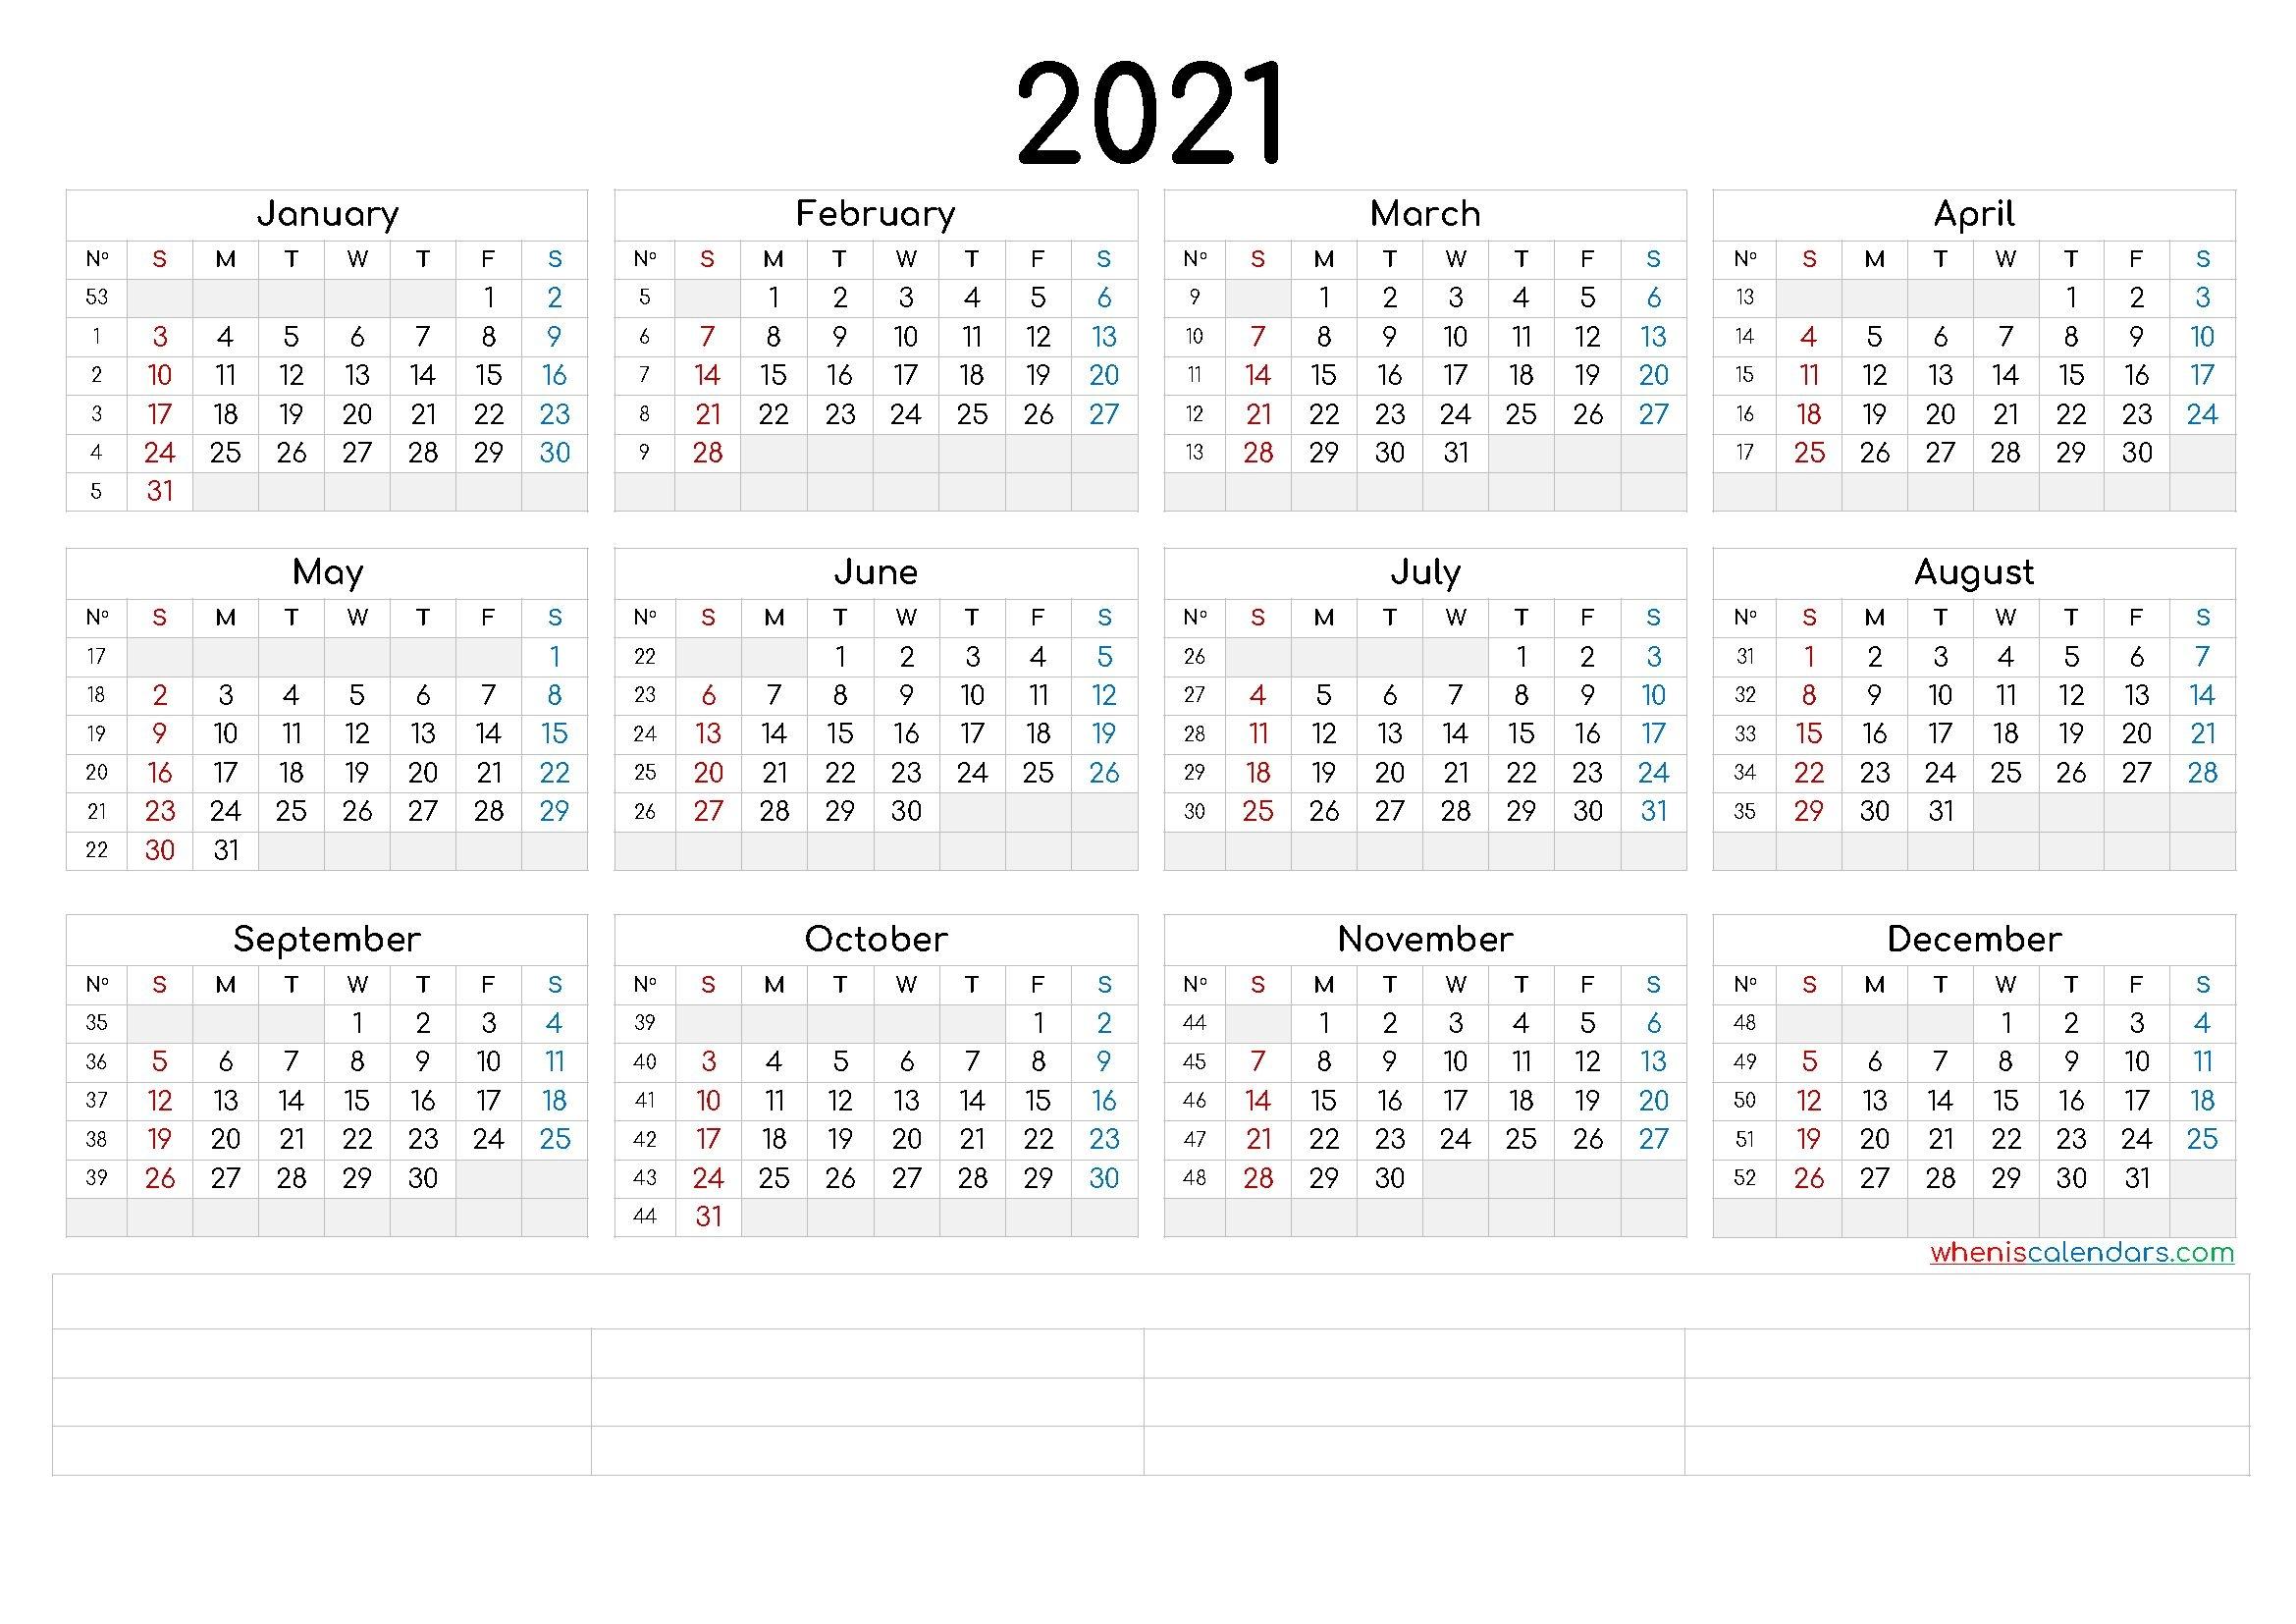 printable 2021 calendaryear (6 templates) – free